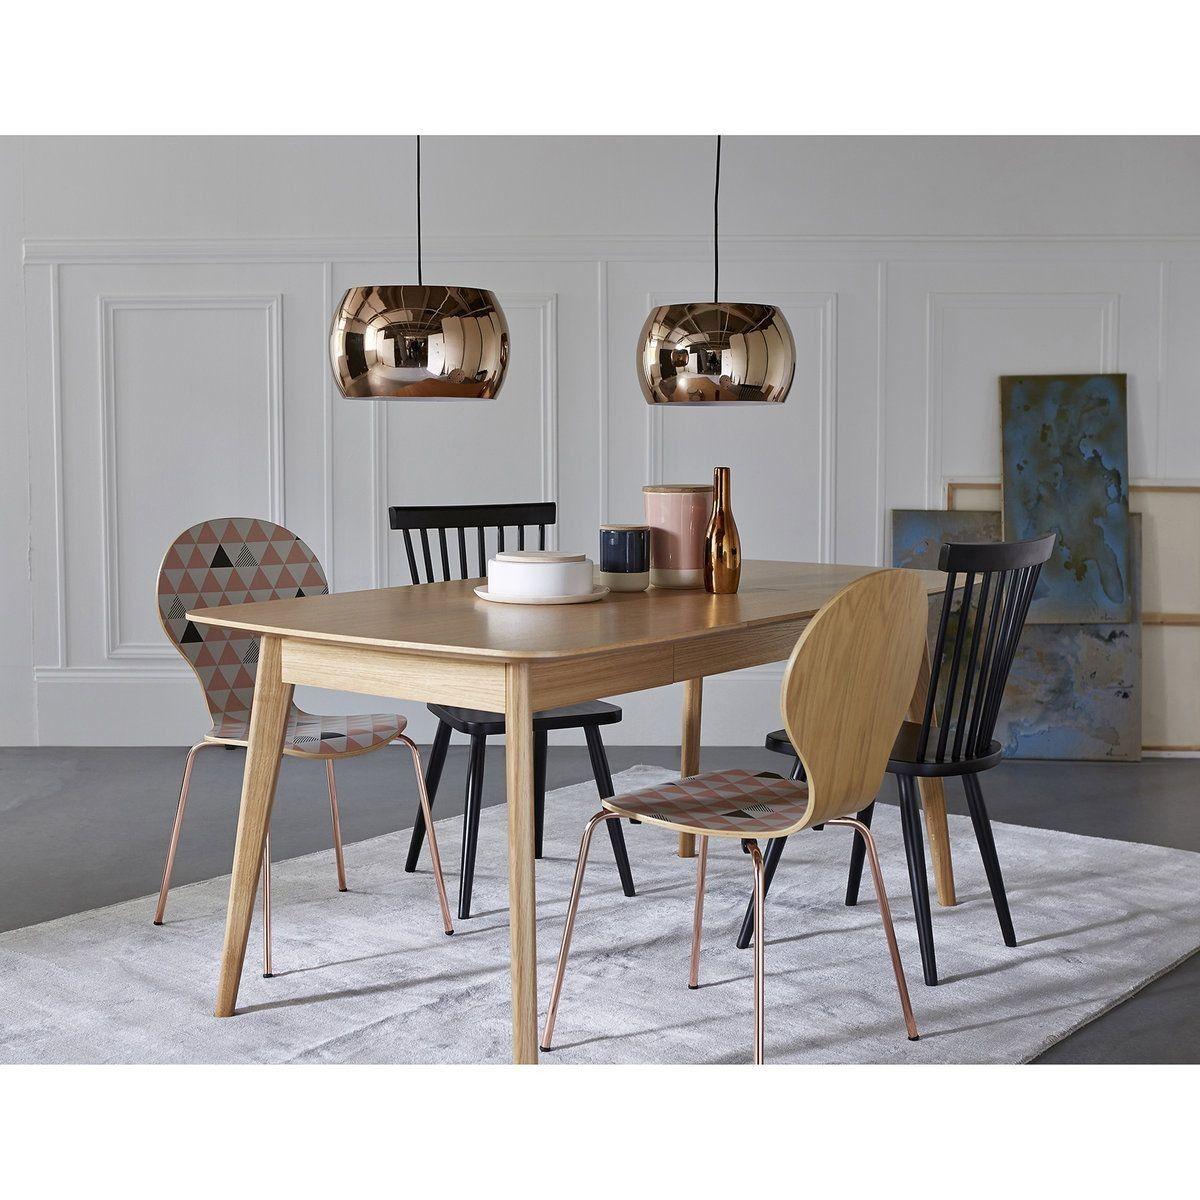 la redoute interieur chaise design